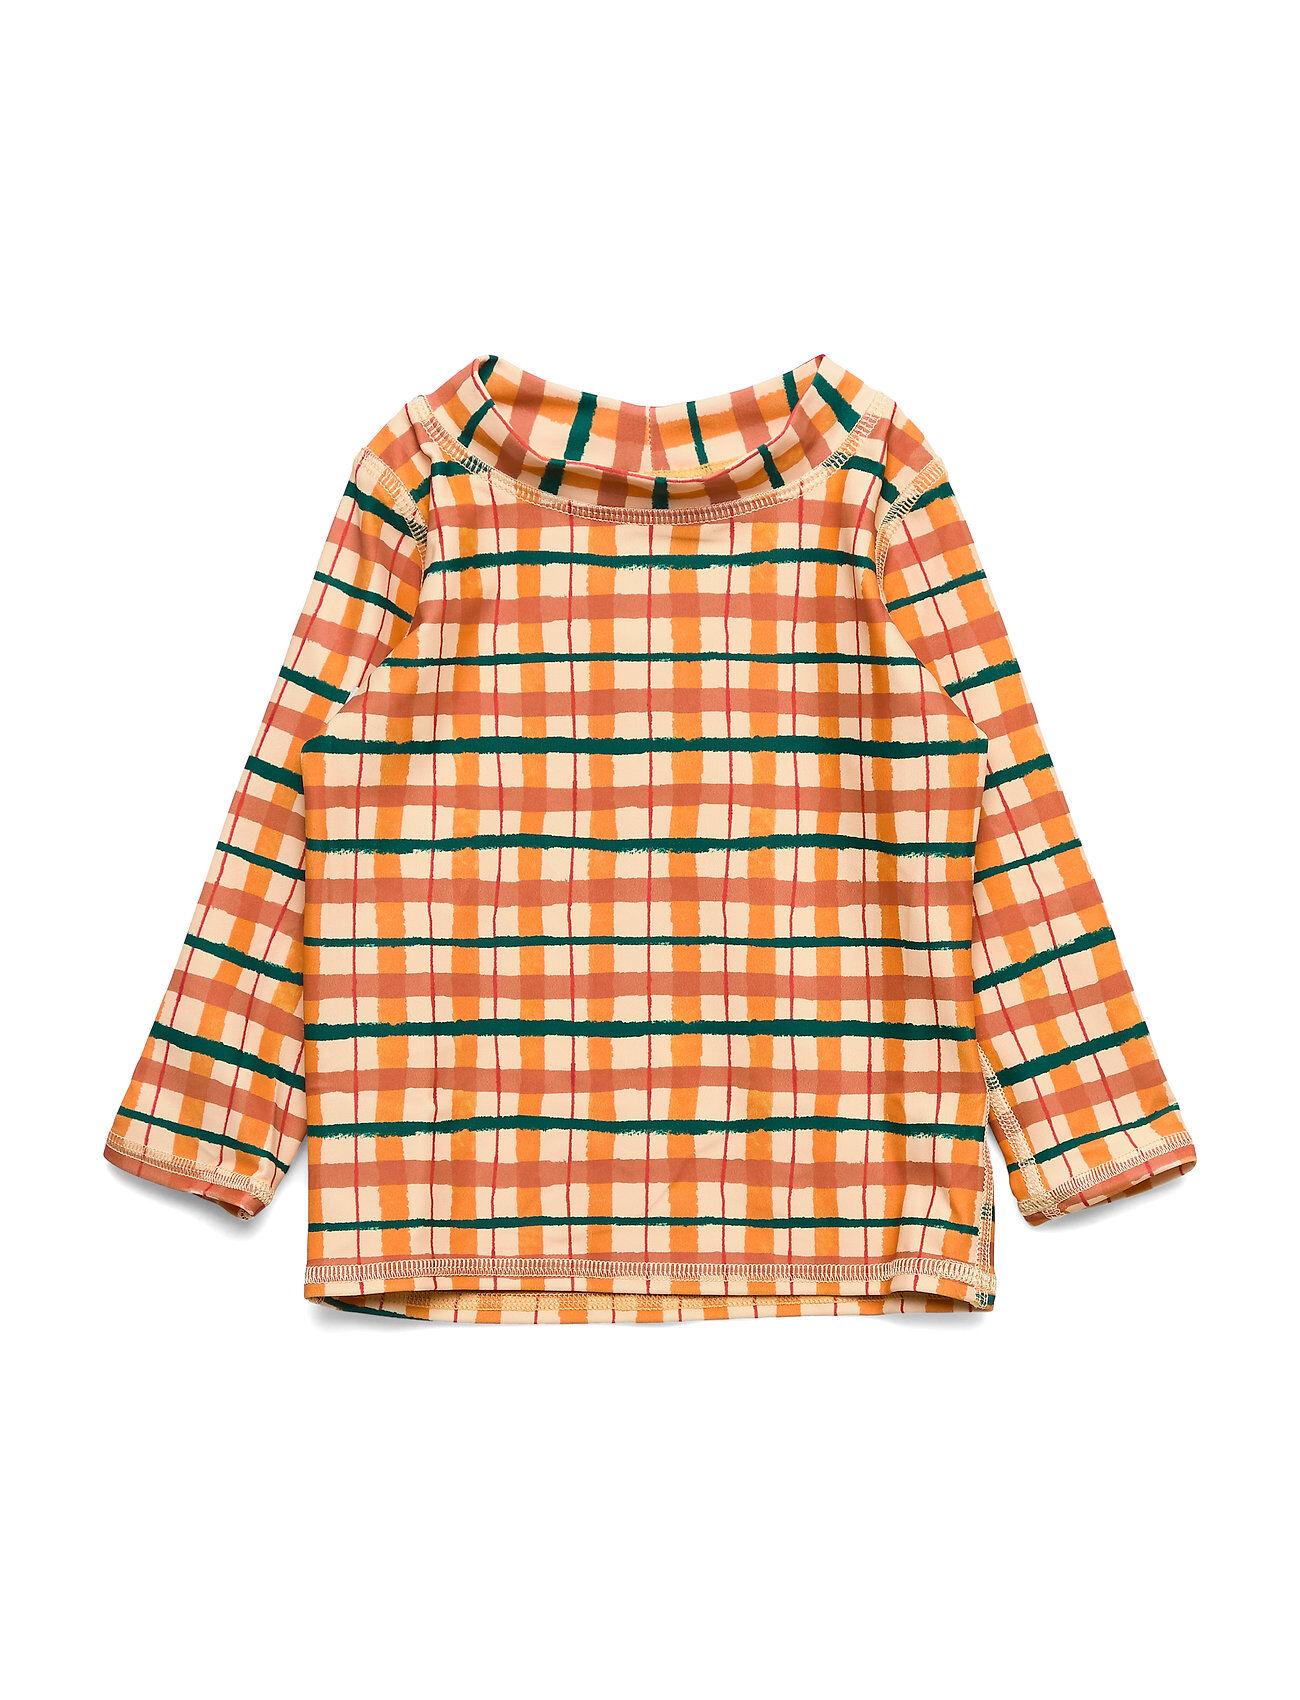 Image of Soft Gallery Baby Astin Sun Shirt Swimwear UV Clothing UV Tops Oranssi Soft Gallery